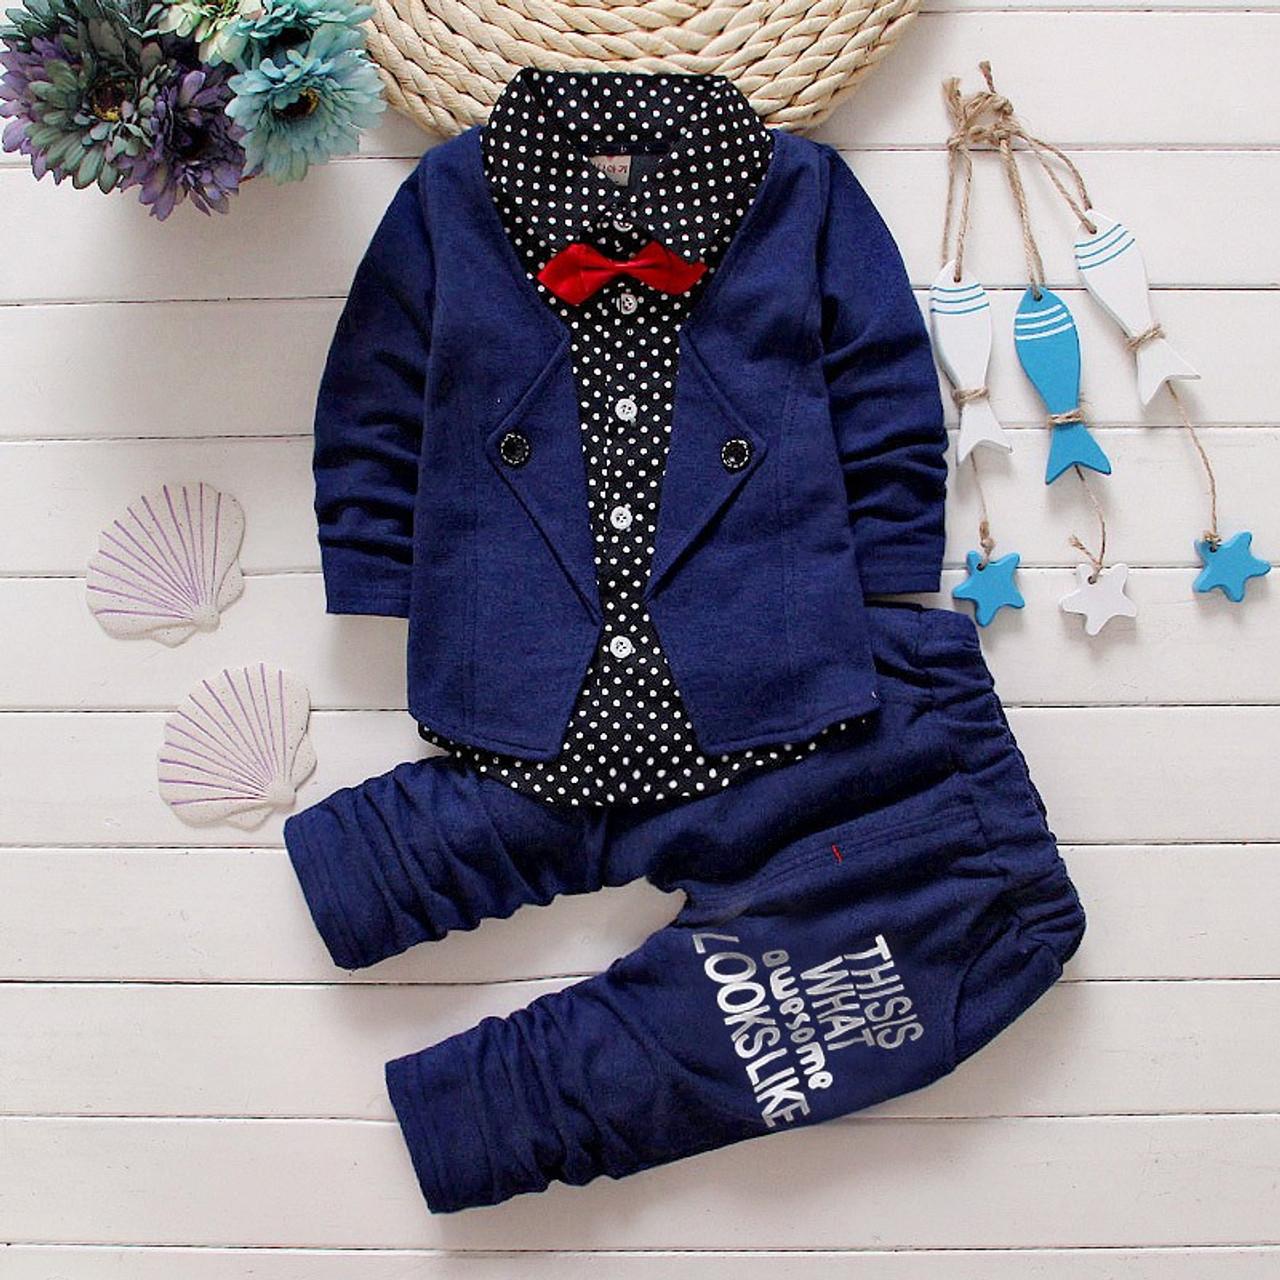 11b3445a3f7a1 BibiCola Spring Autumn Baby Boys Clothing Set Casual Kids Sport suit Infant  Toddler Boys Clothes Top Coat + Pants Tracksuit Set